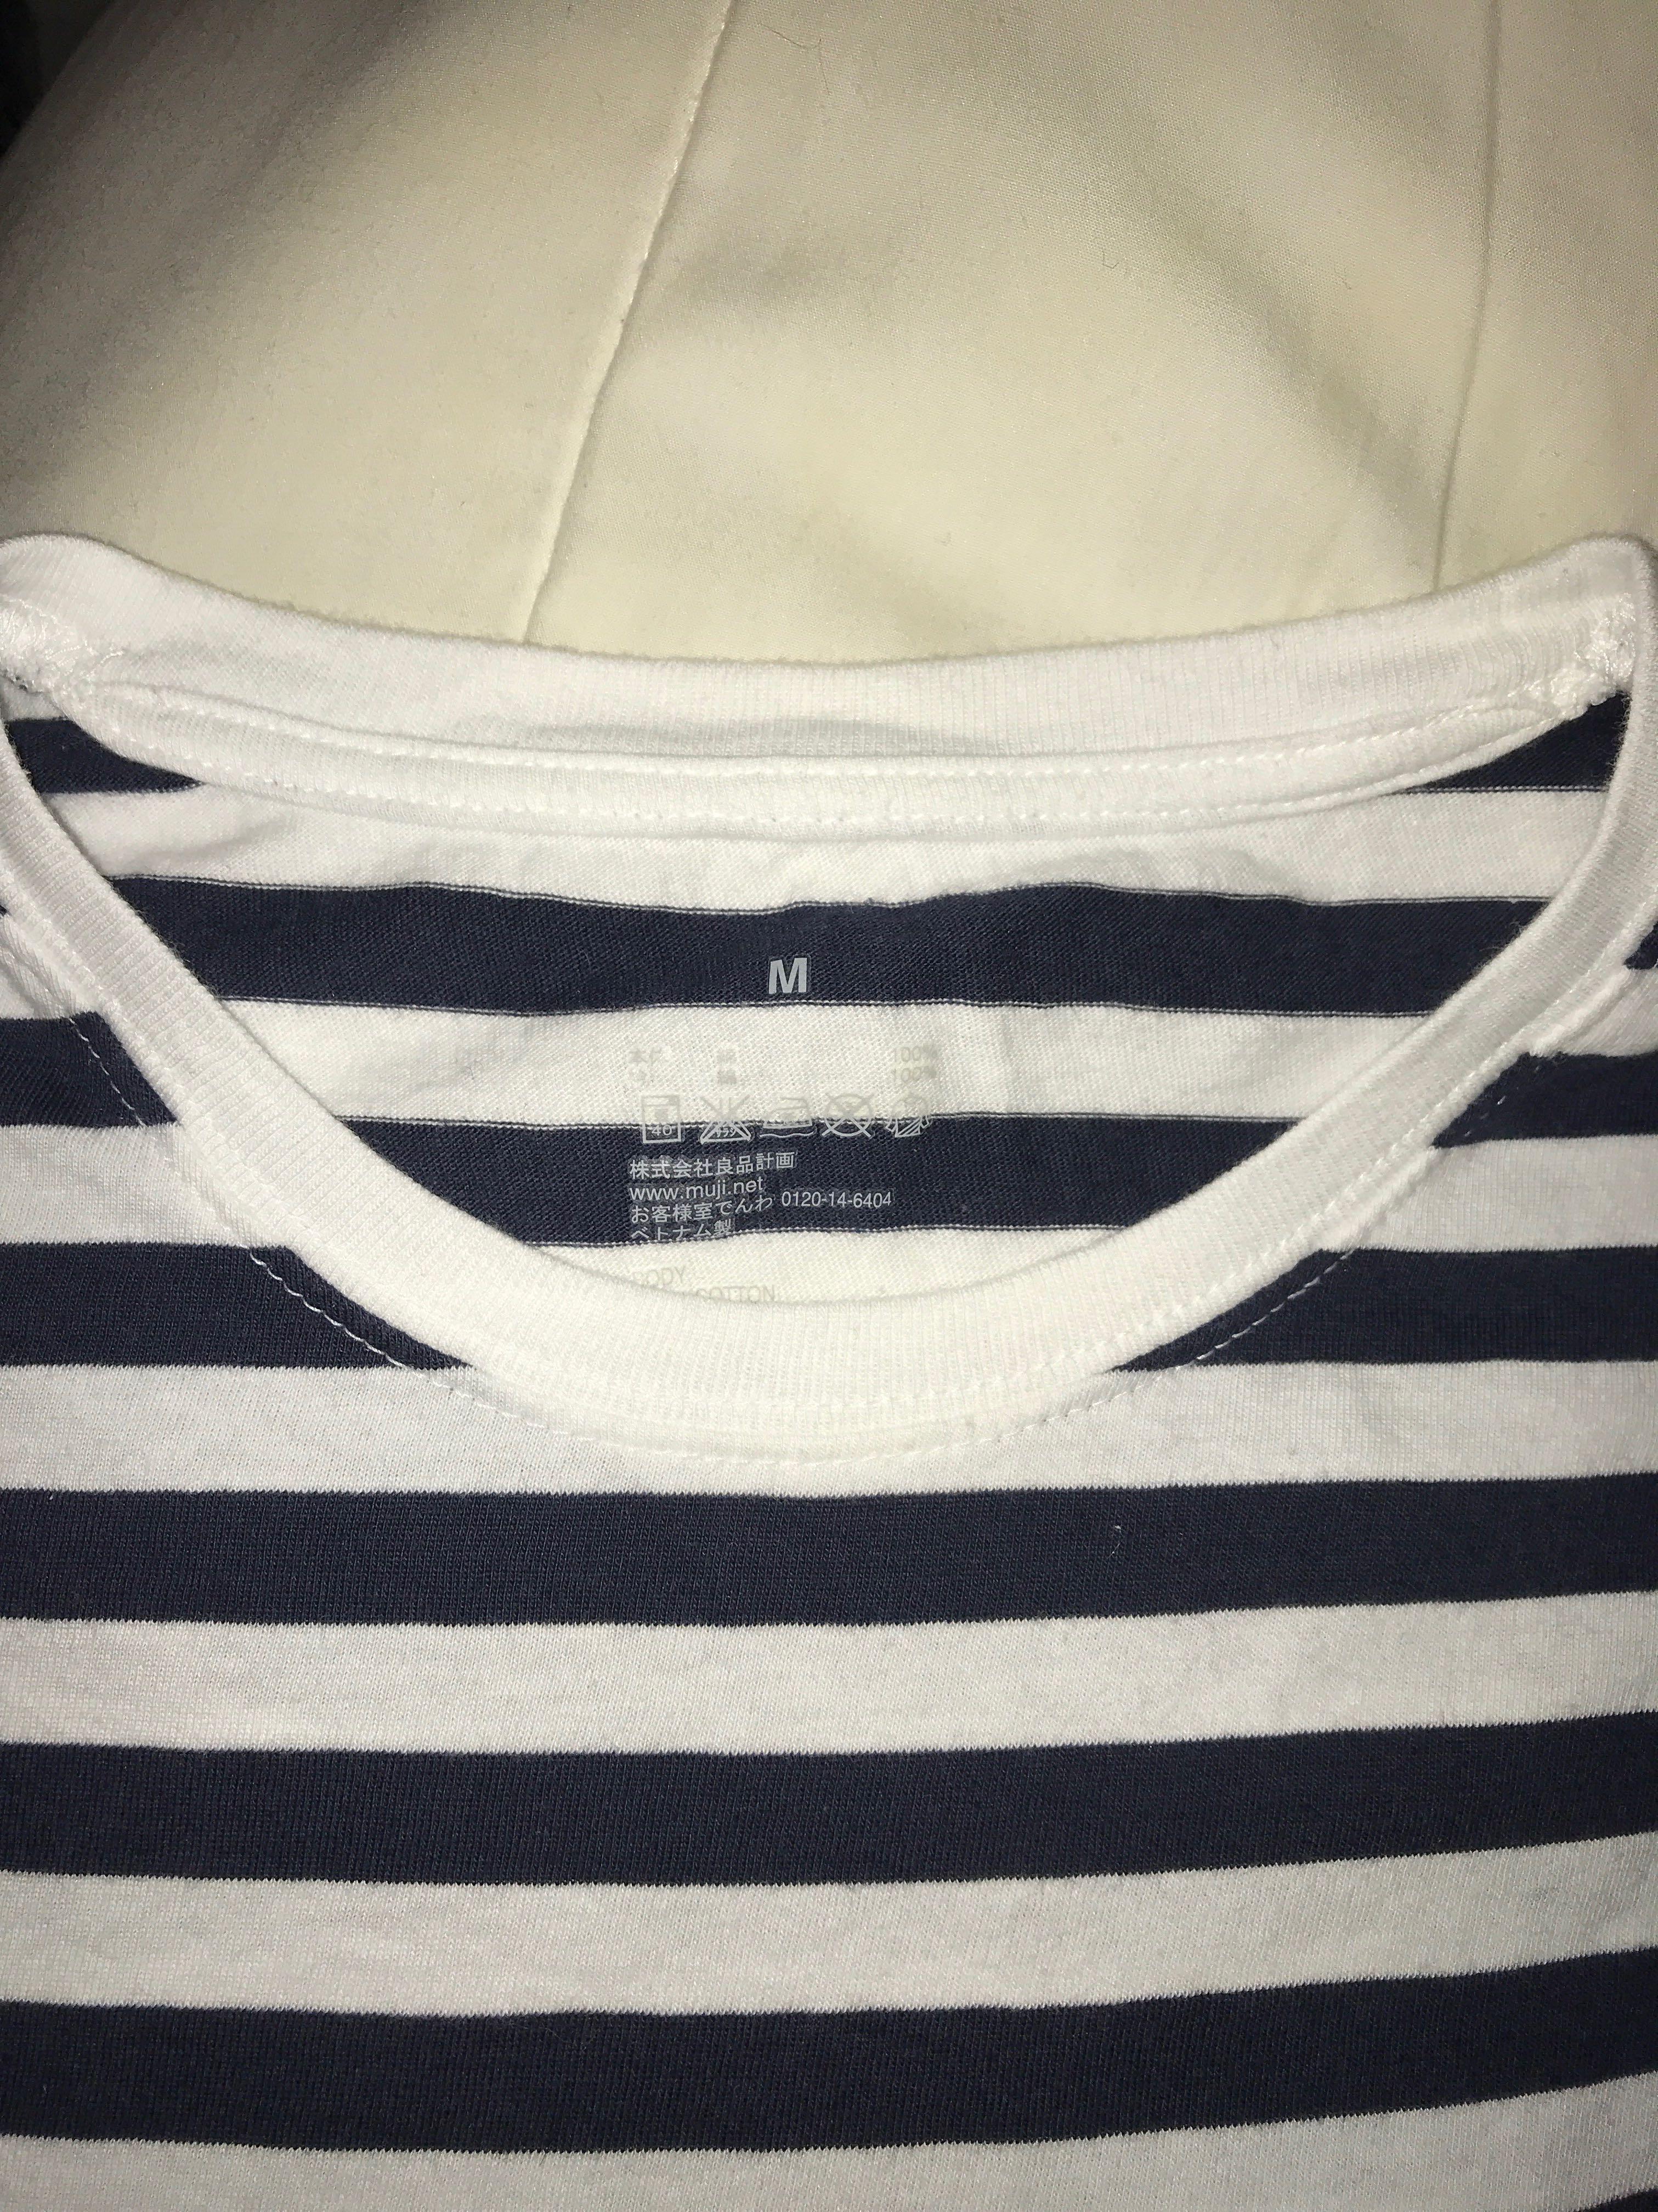 Black Muji striped shirt